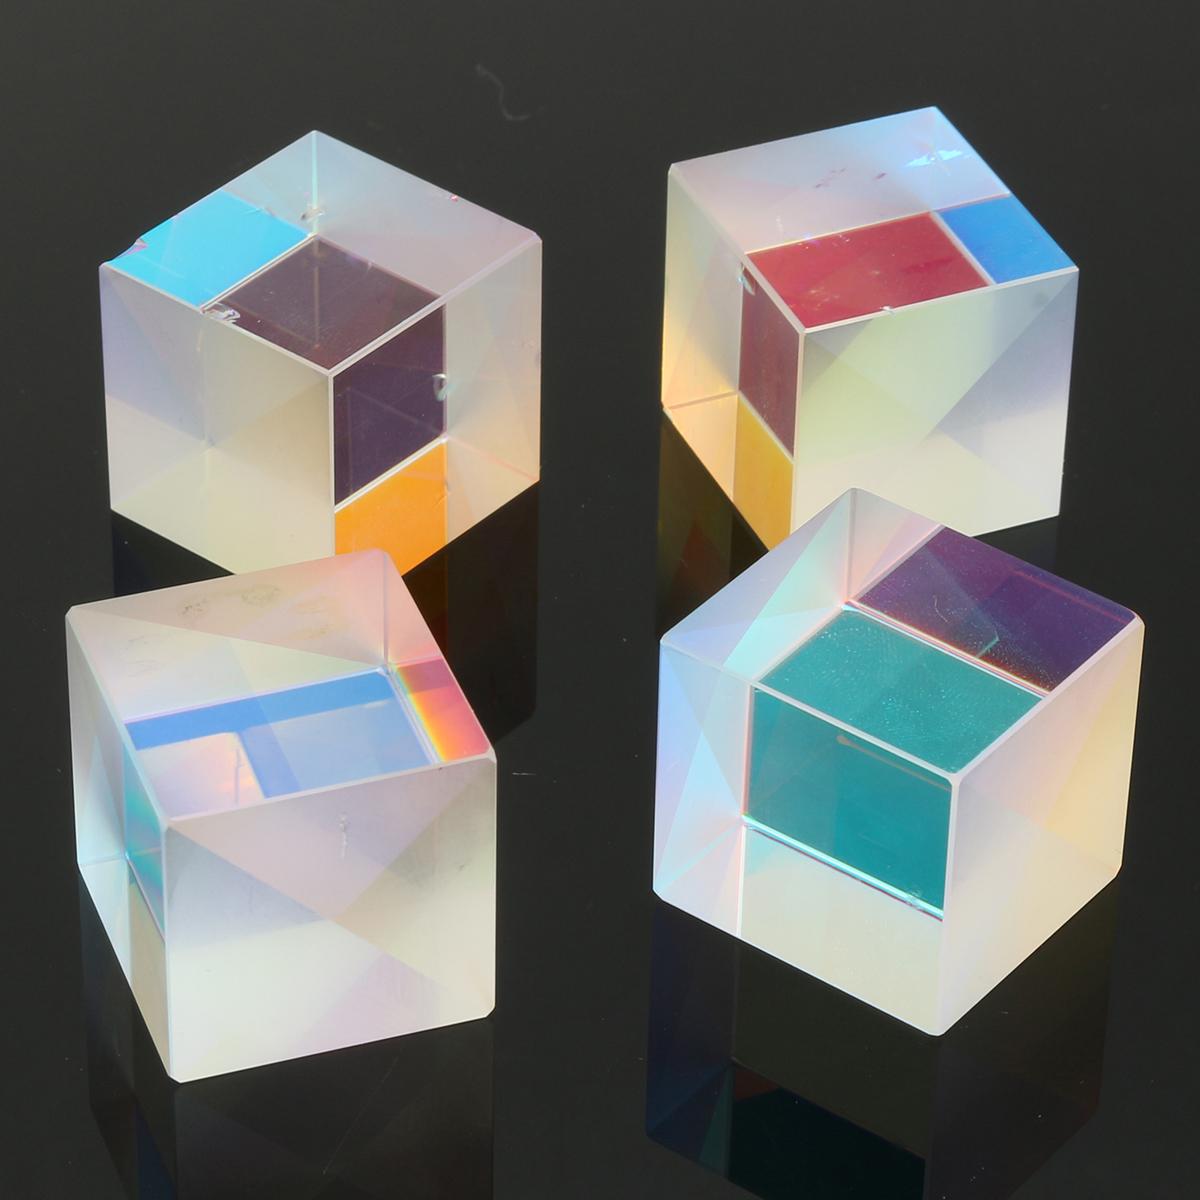 Optical-Glass-Triple-Triangular-Cube-Prism-Box-Physics-Teaching-Light-Spectrum thumbnail 14